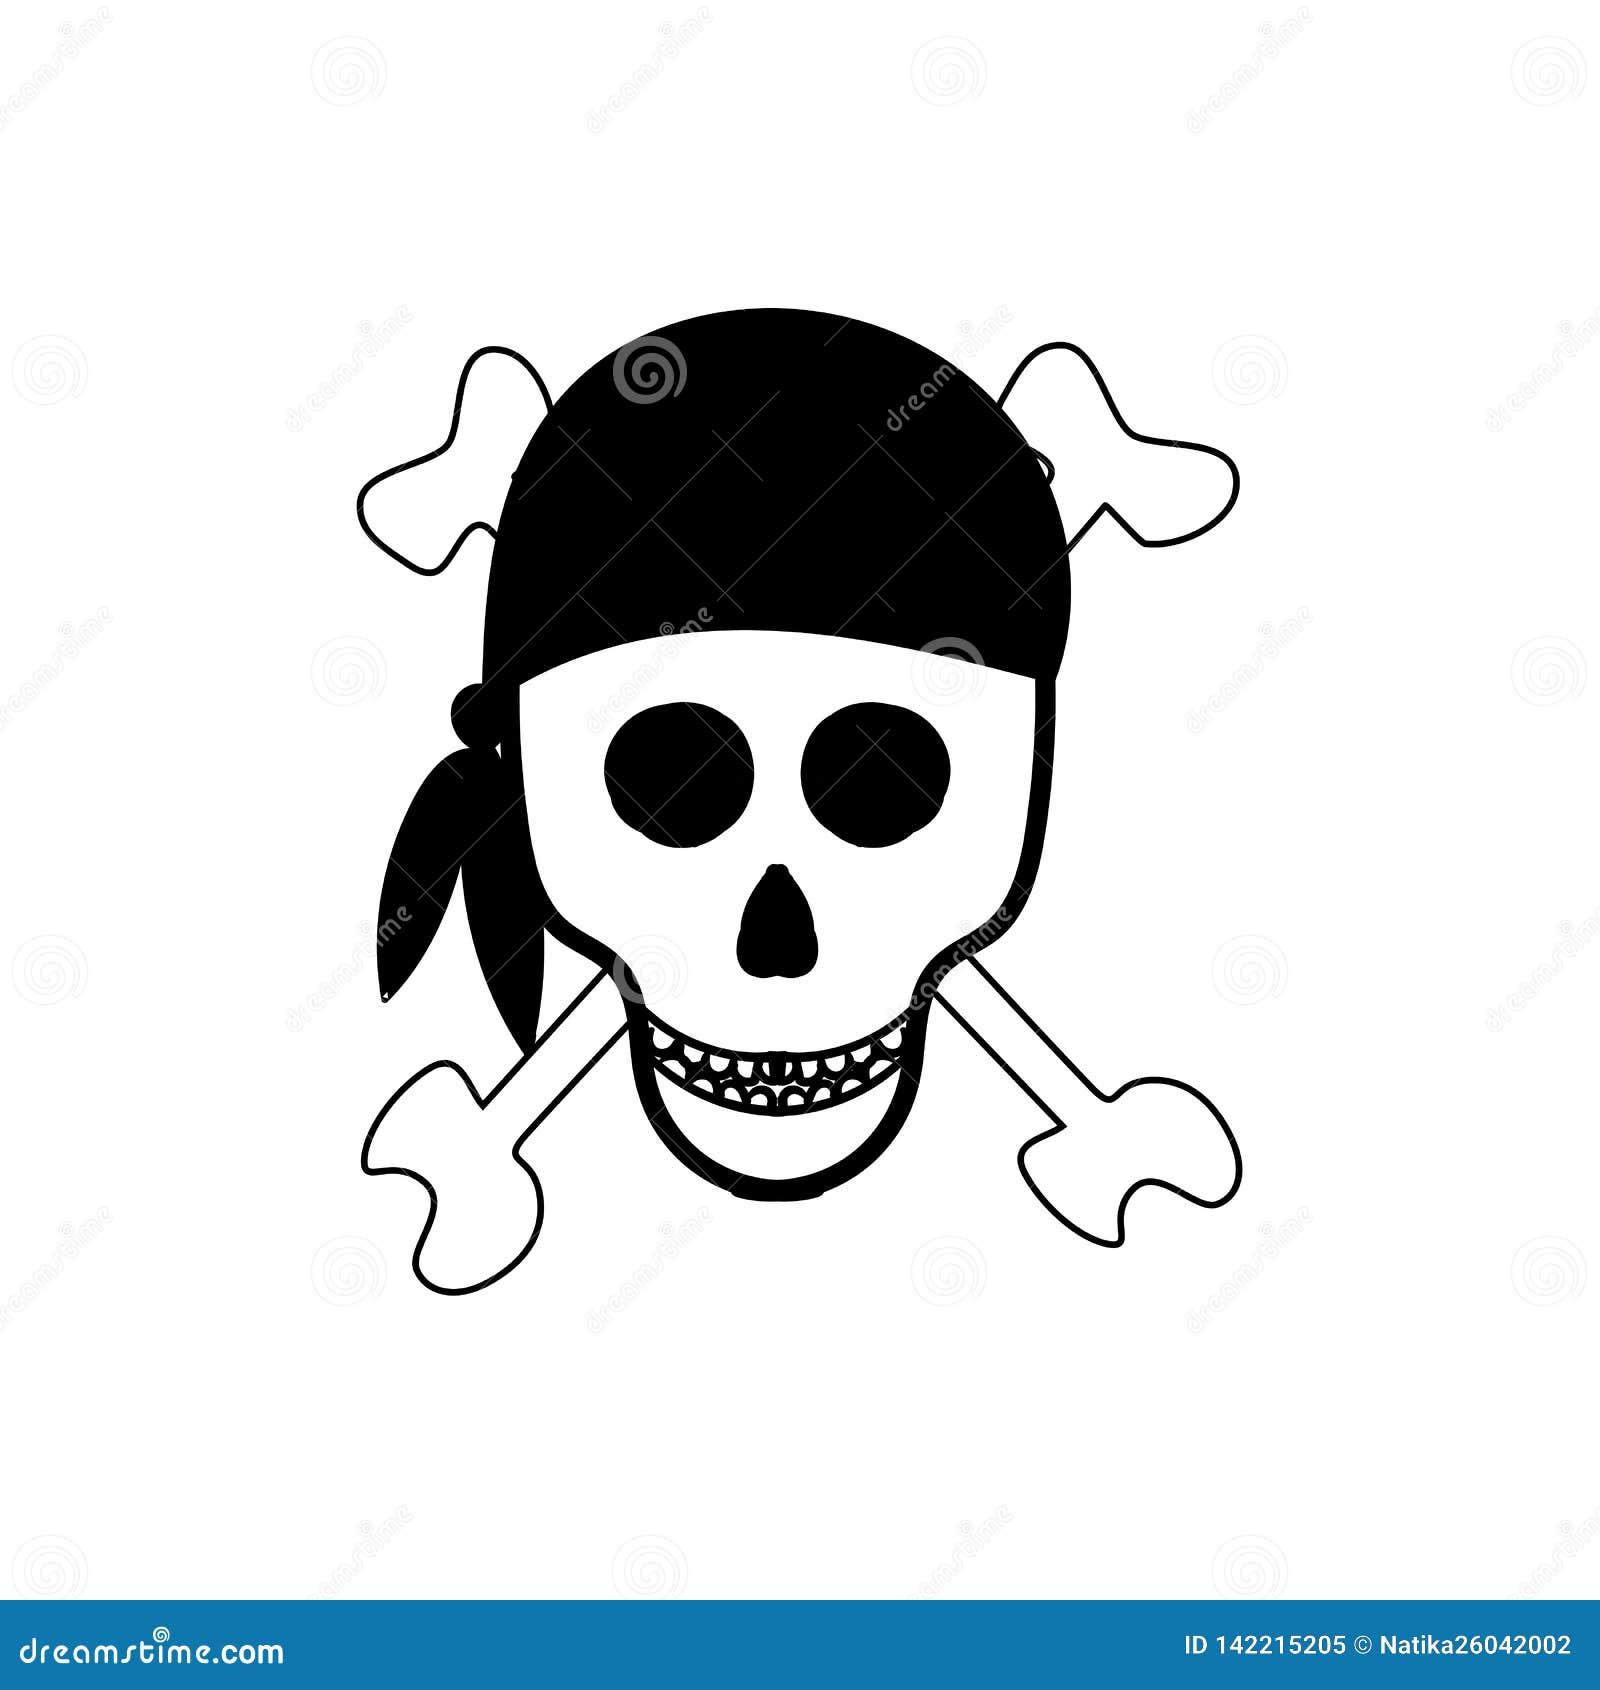 Skull and bones. Pirate sign. Vector illustration.